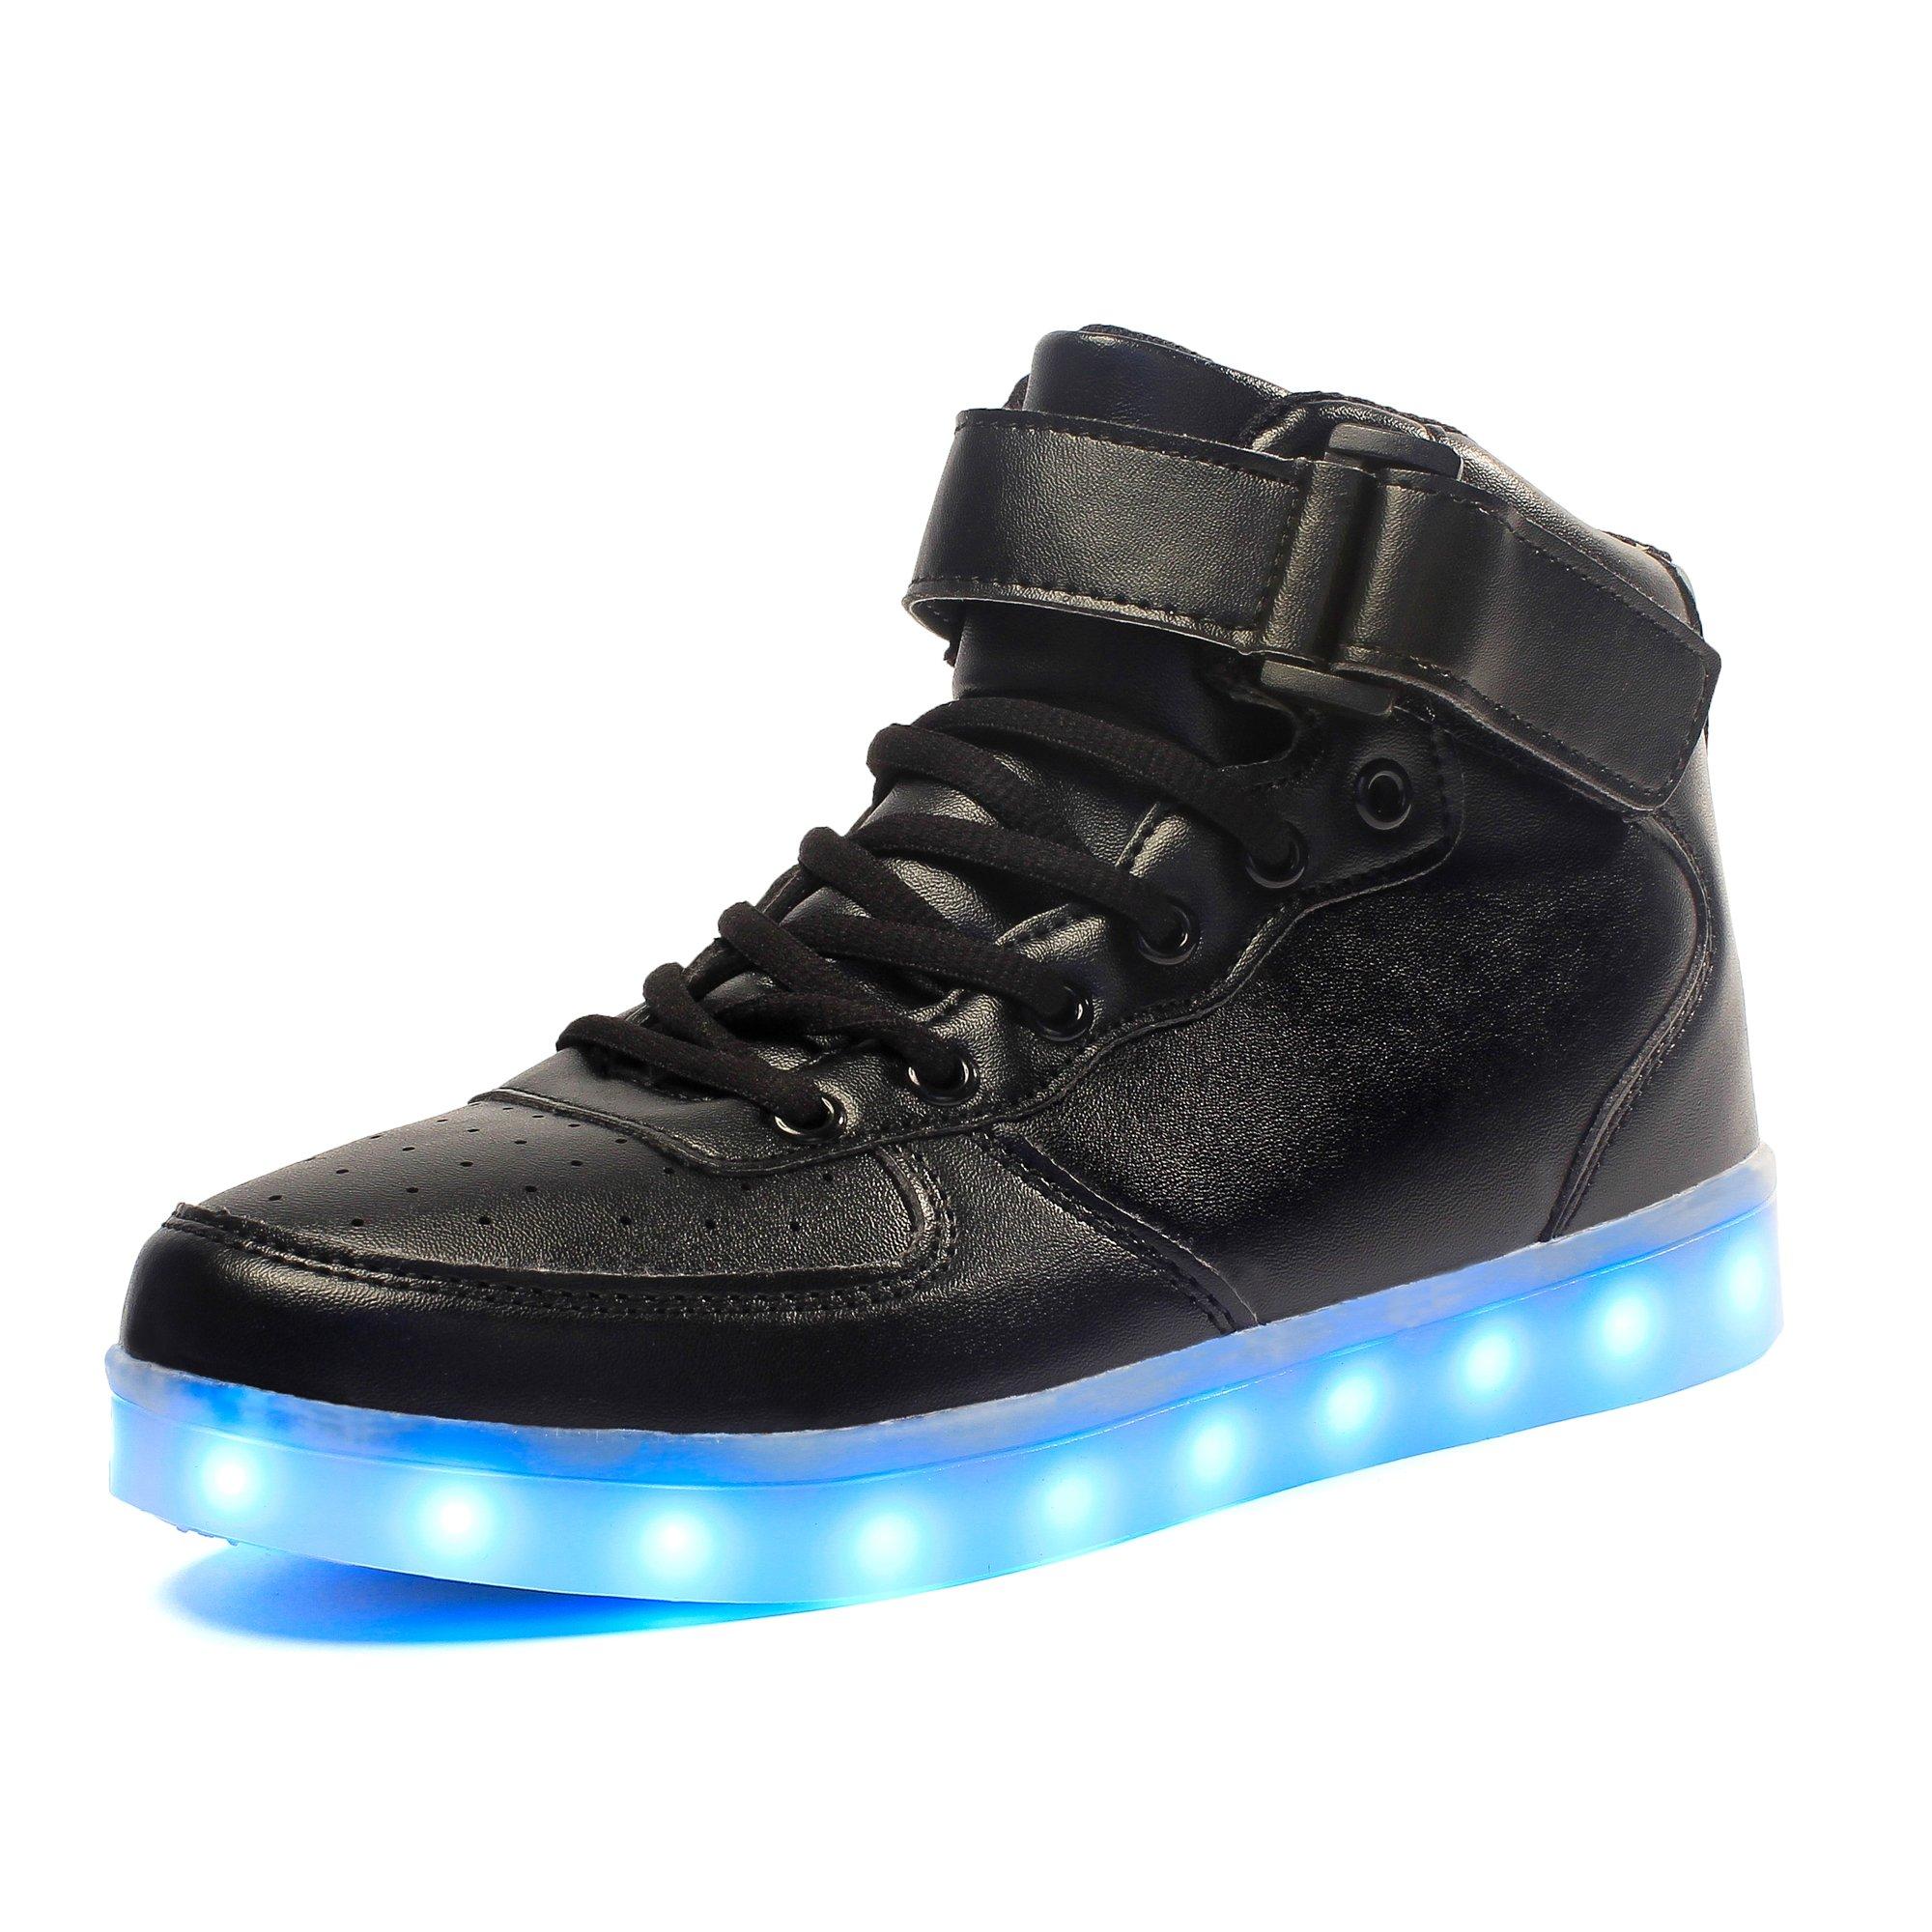 LGXH Waterproof Boys Girls Causal Sneakers Soft Breathable Slip On Kids Sports Running Walking Shoes